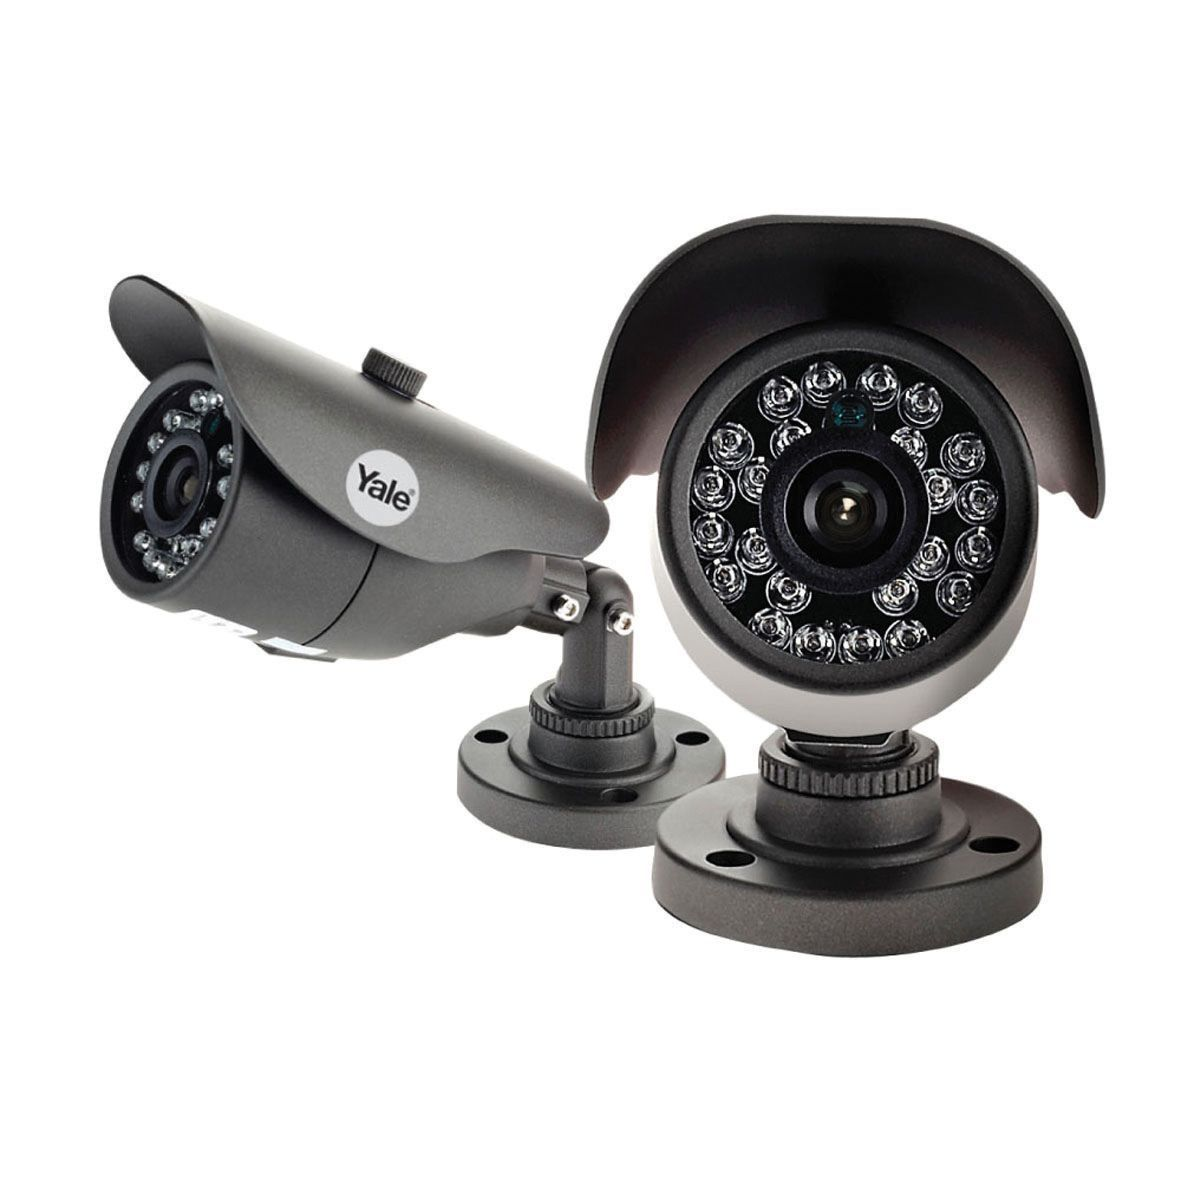 Garage Lights With Camera: Yale HDC-303G-2 HD Bullet CCTV Camera